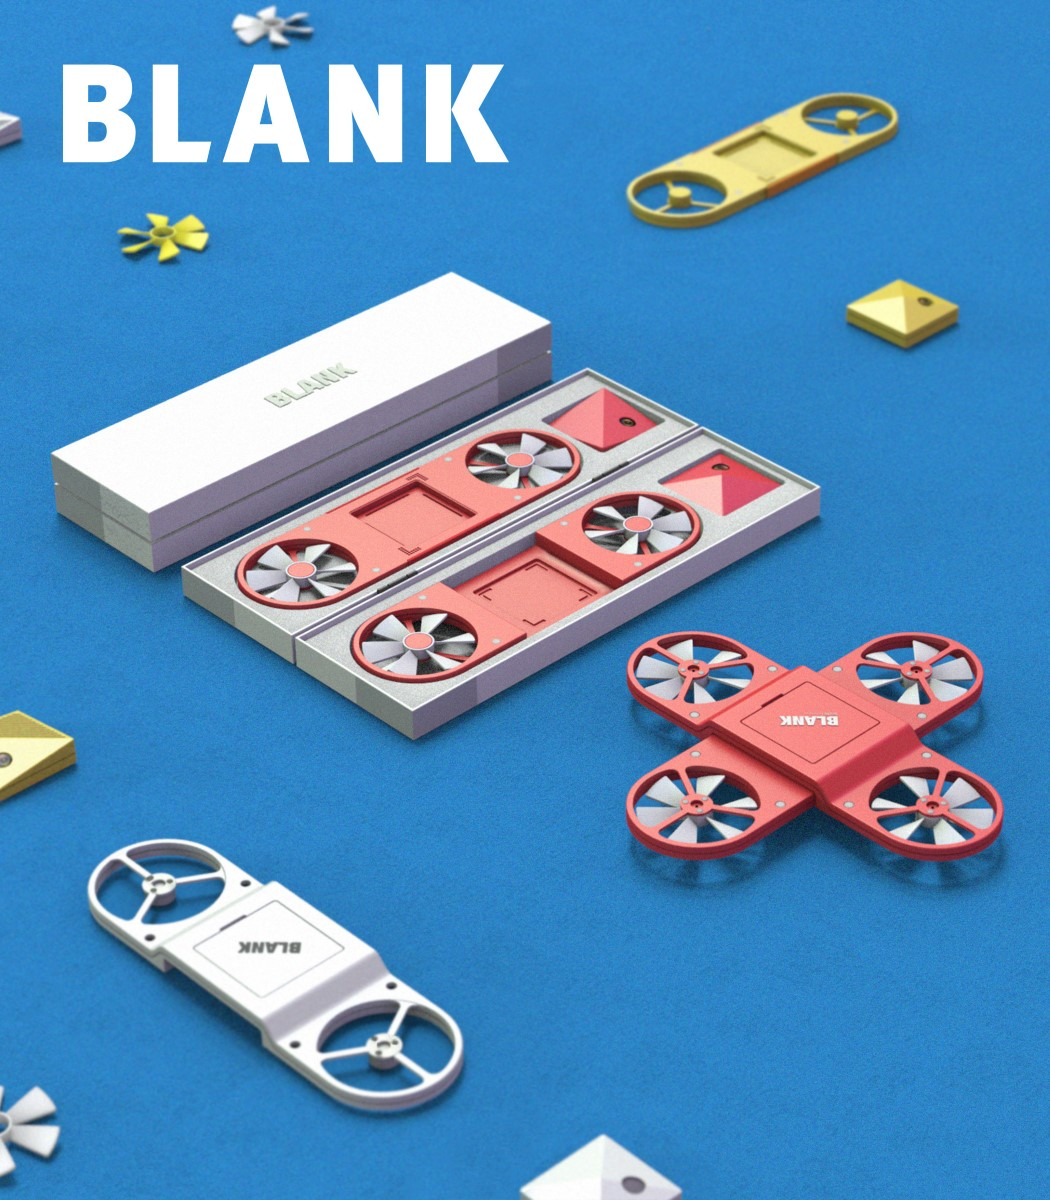 blank_drone_1